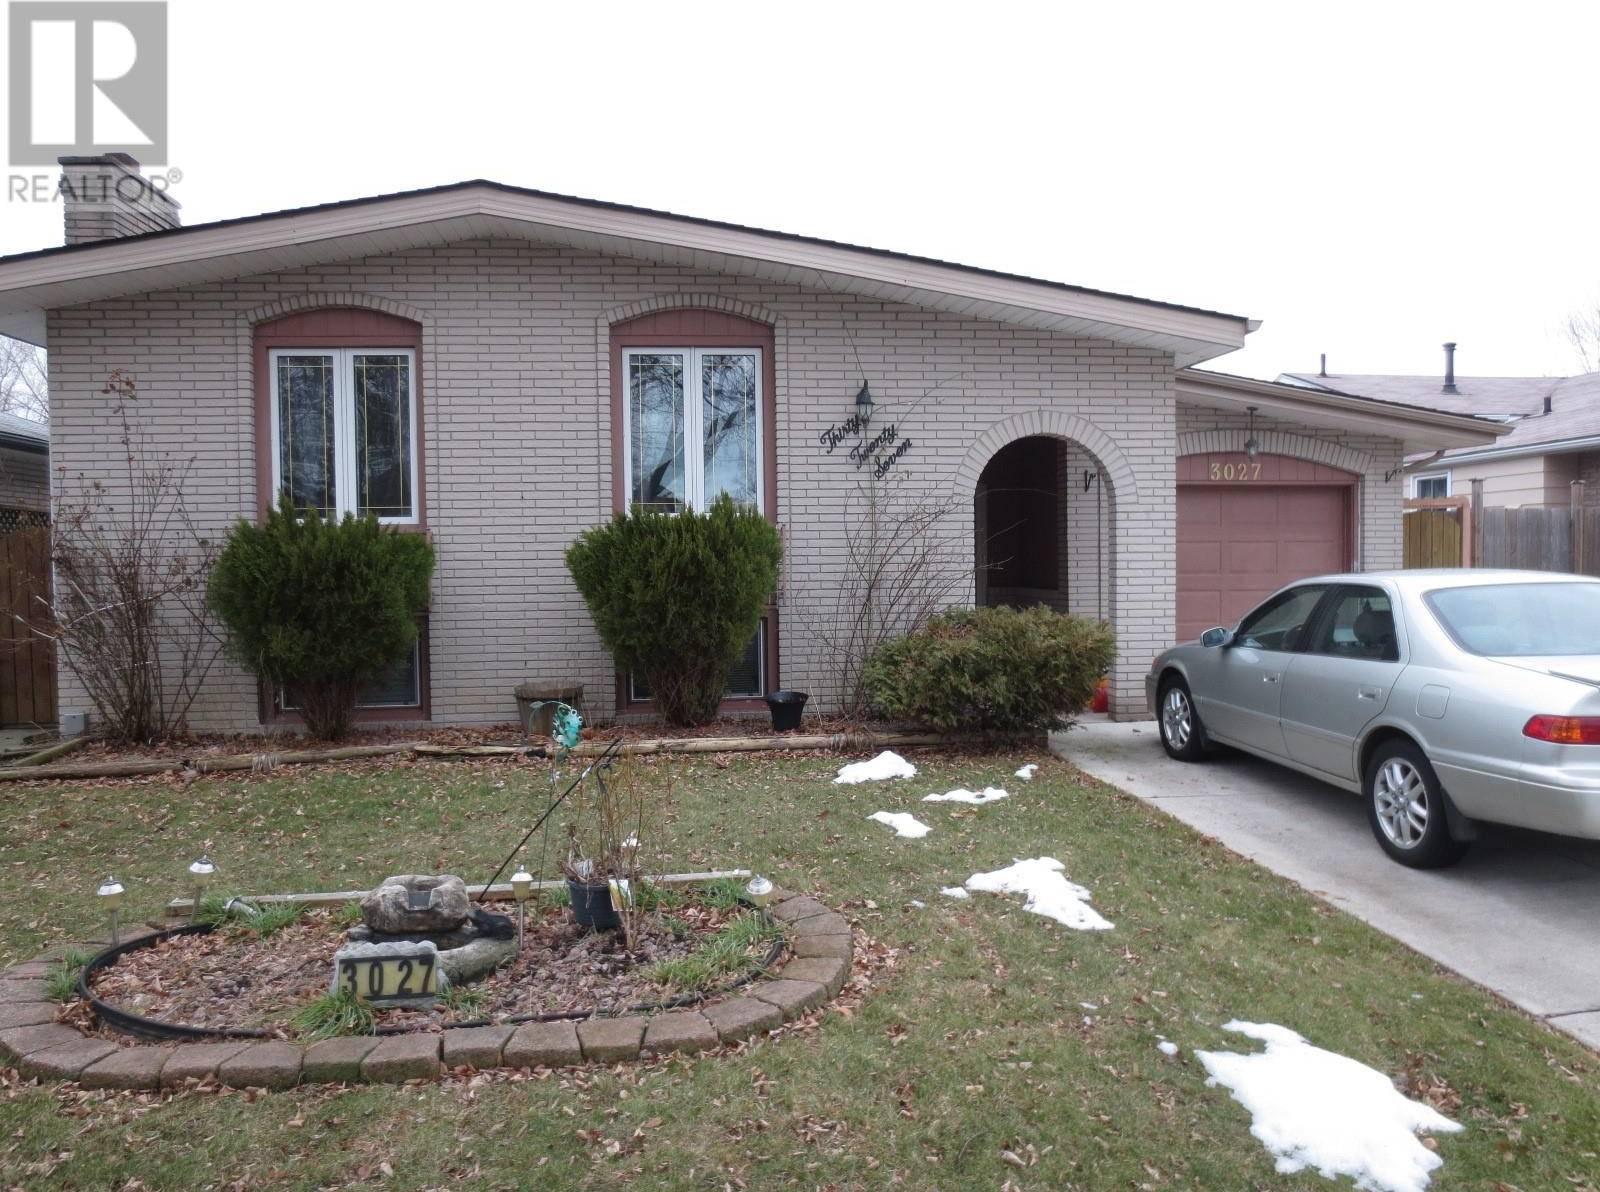 House for sale at 3027 Regis  Windsor Ontario - MLS: 20001037